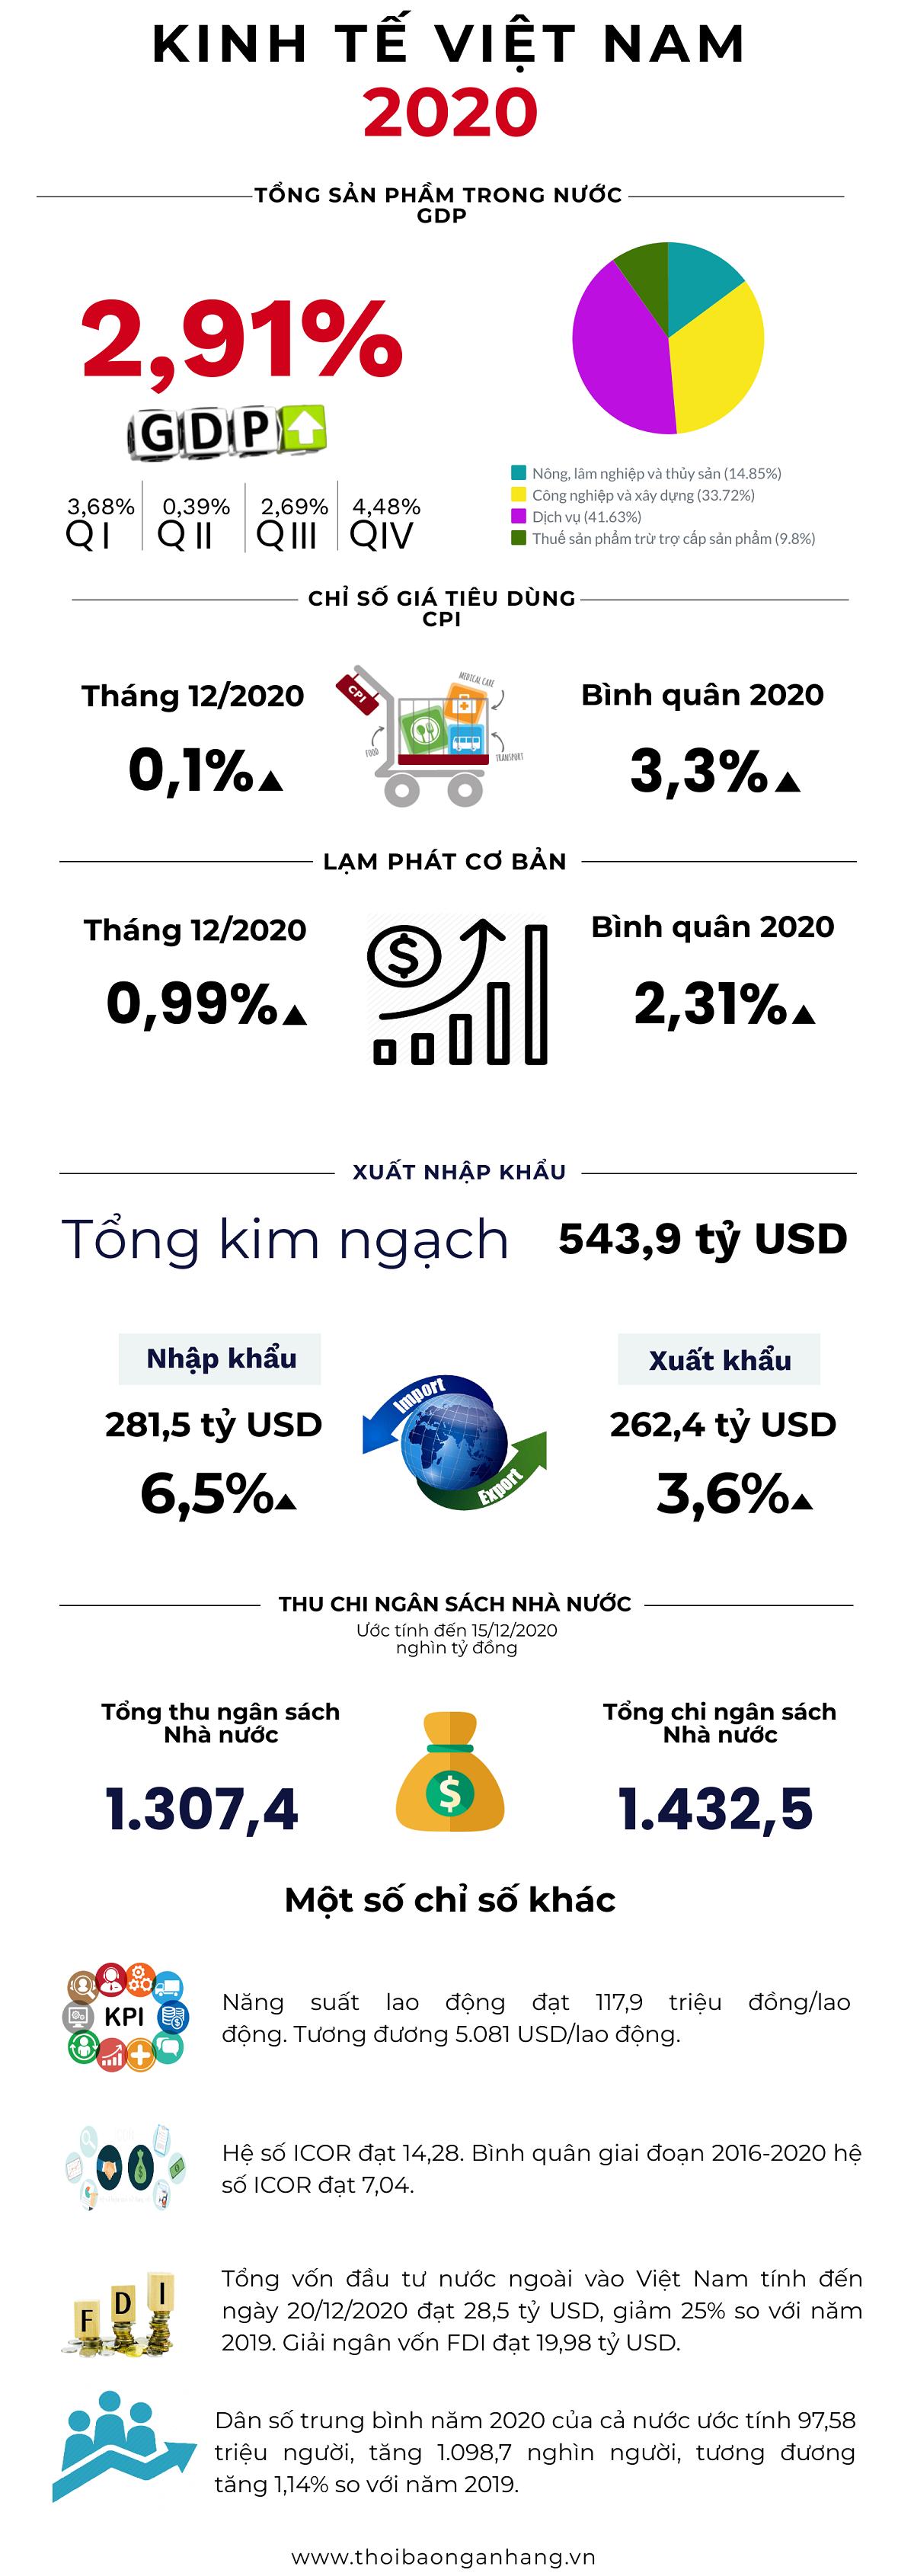 infographic kinh te viet nam 2020